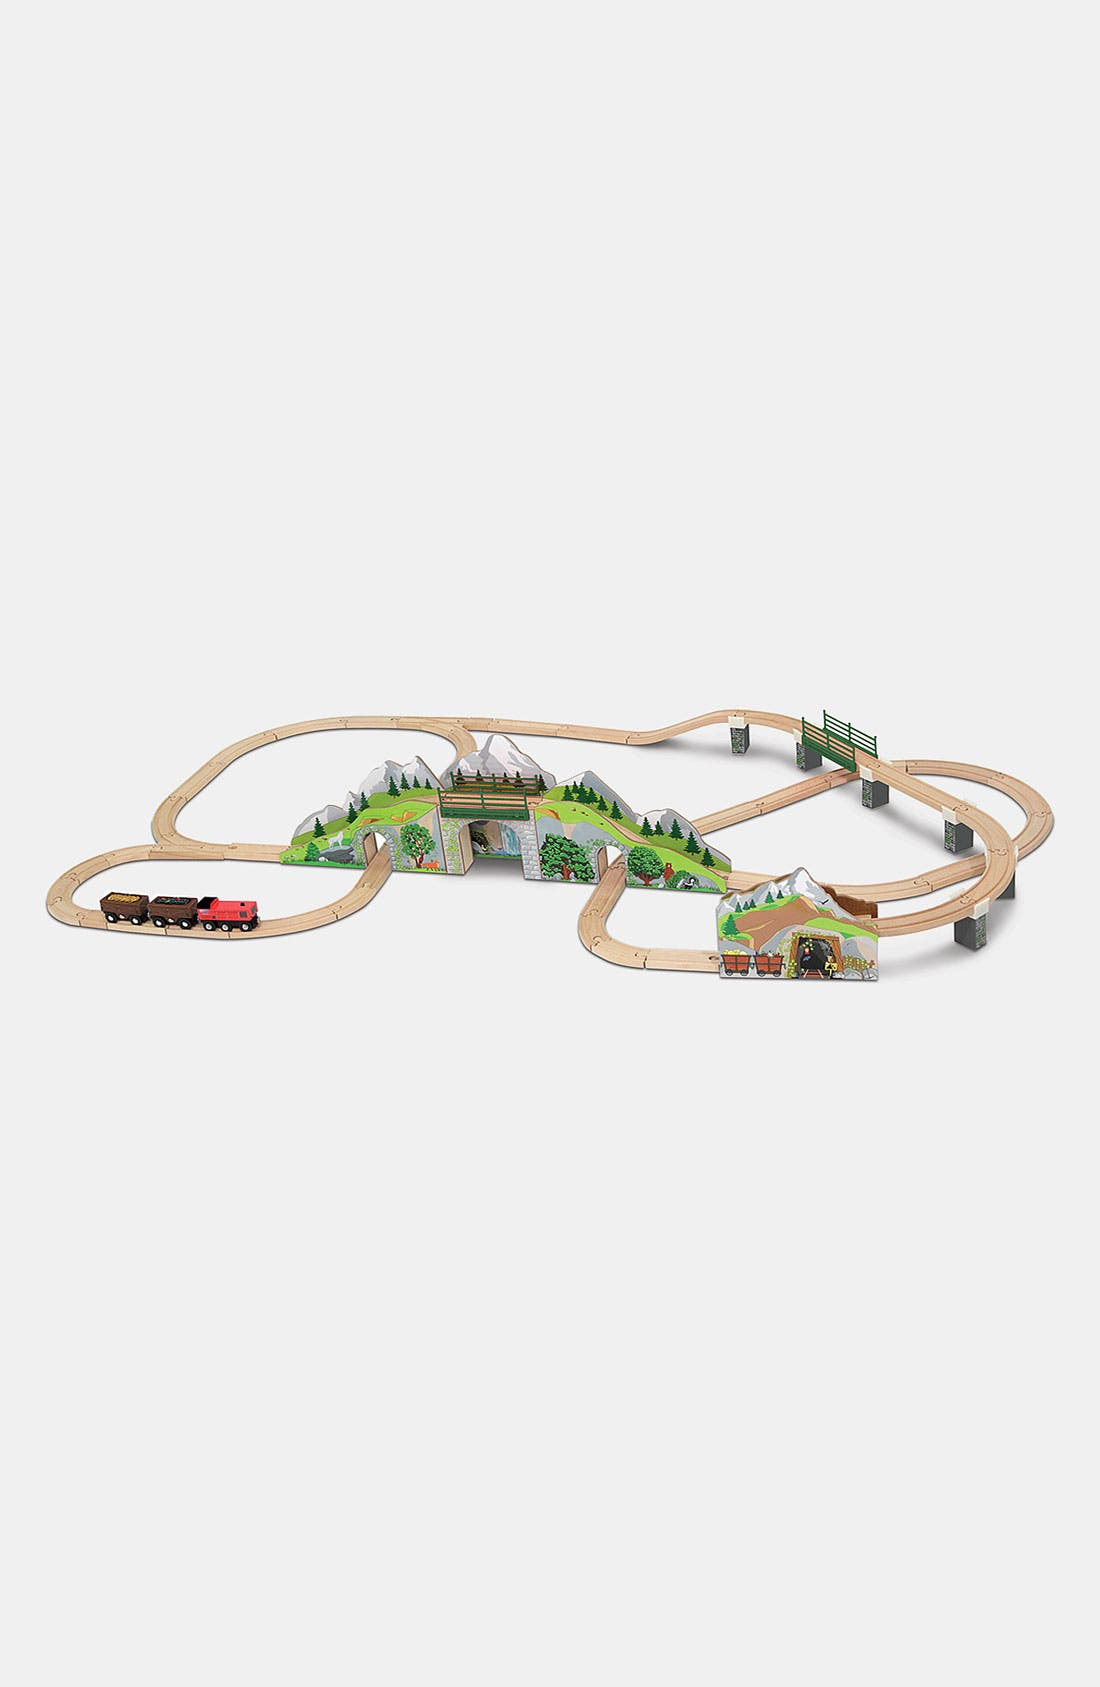 Alternate Image 1 Selected - Melissa & Doug 'Mountain Tunnel' Wooden Train Toy